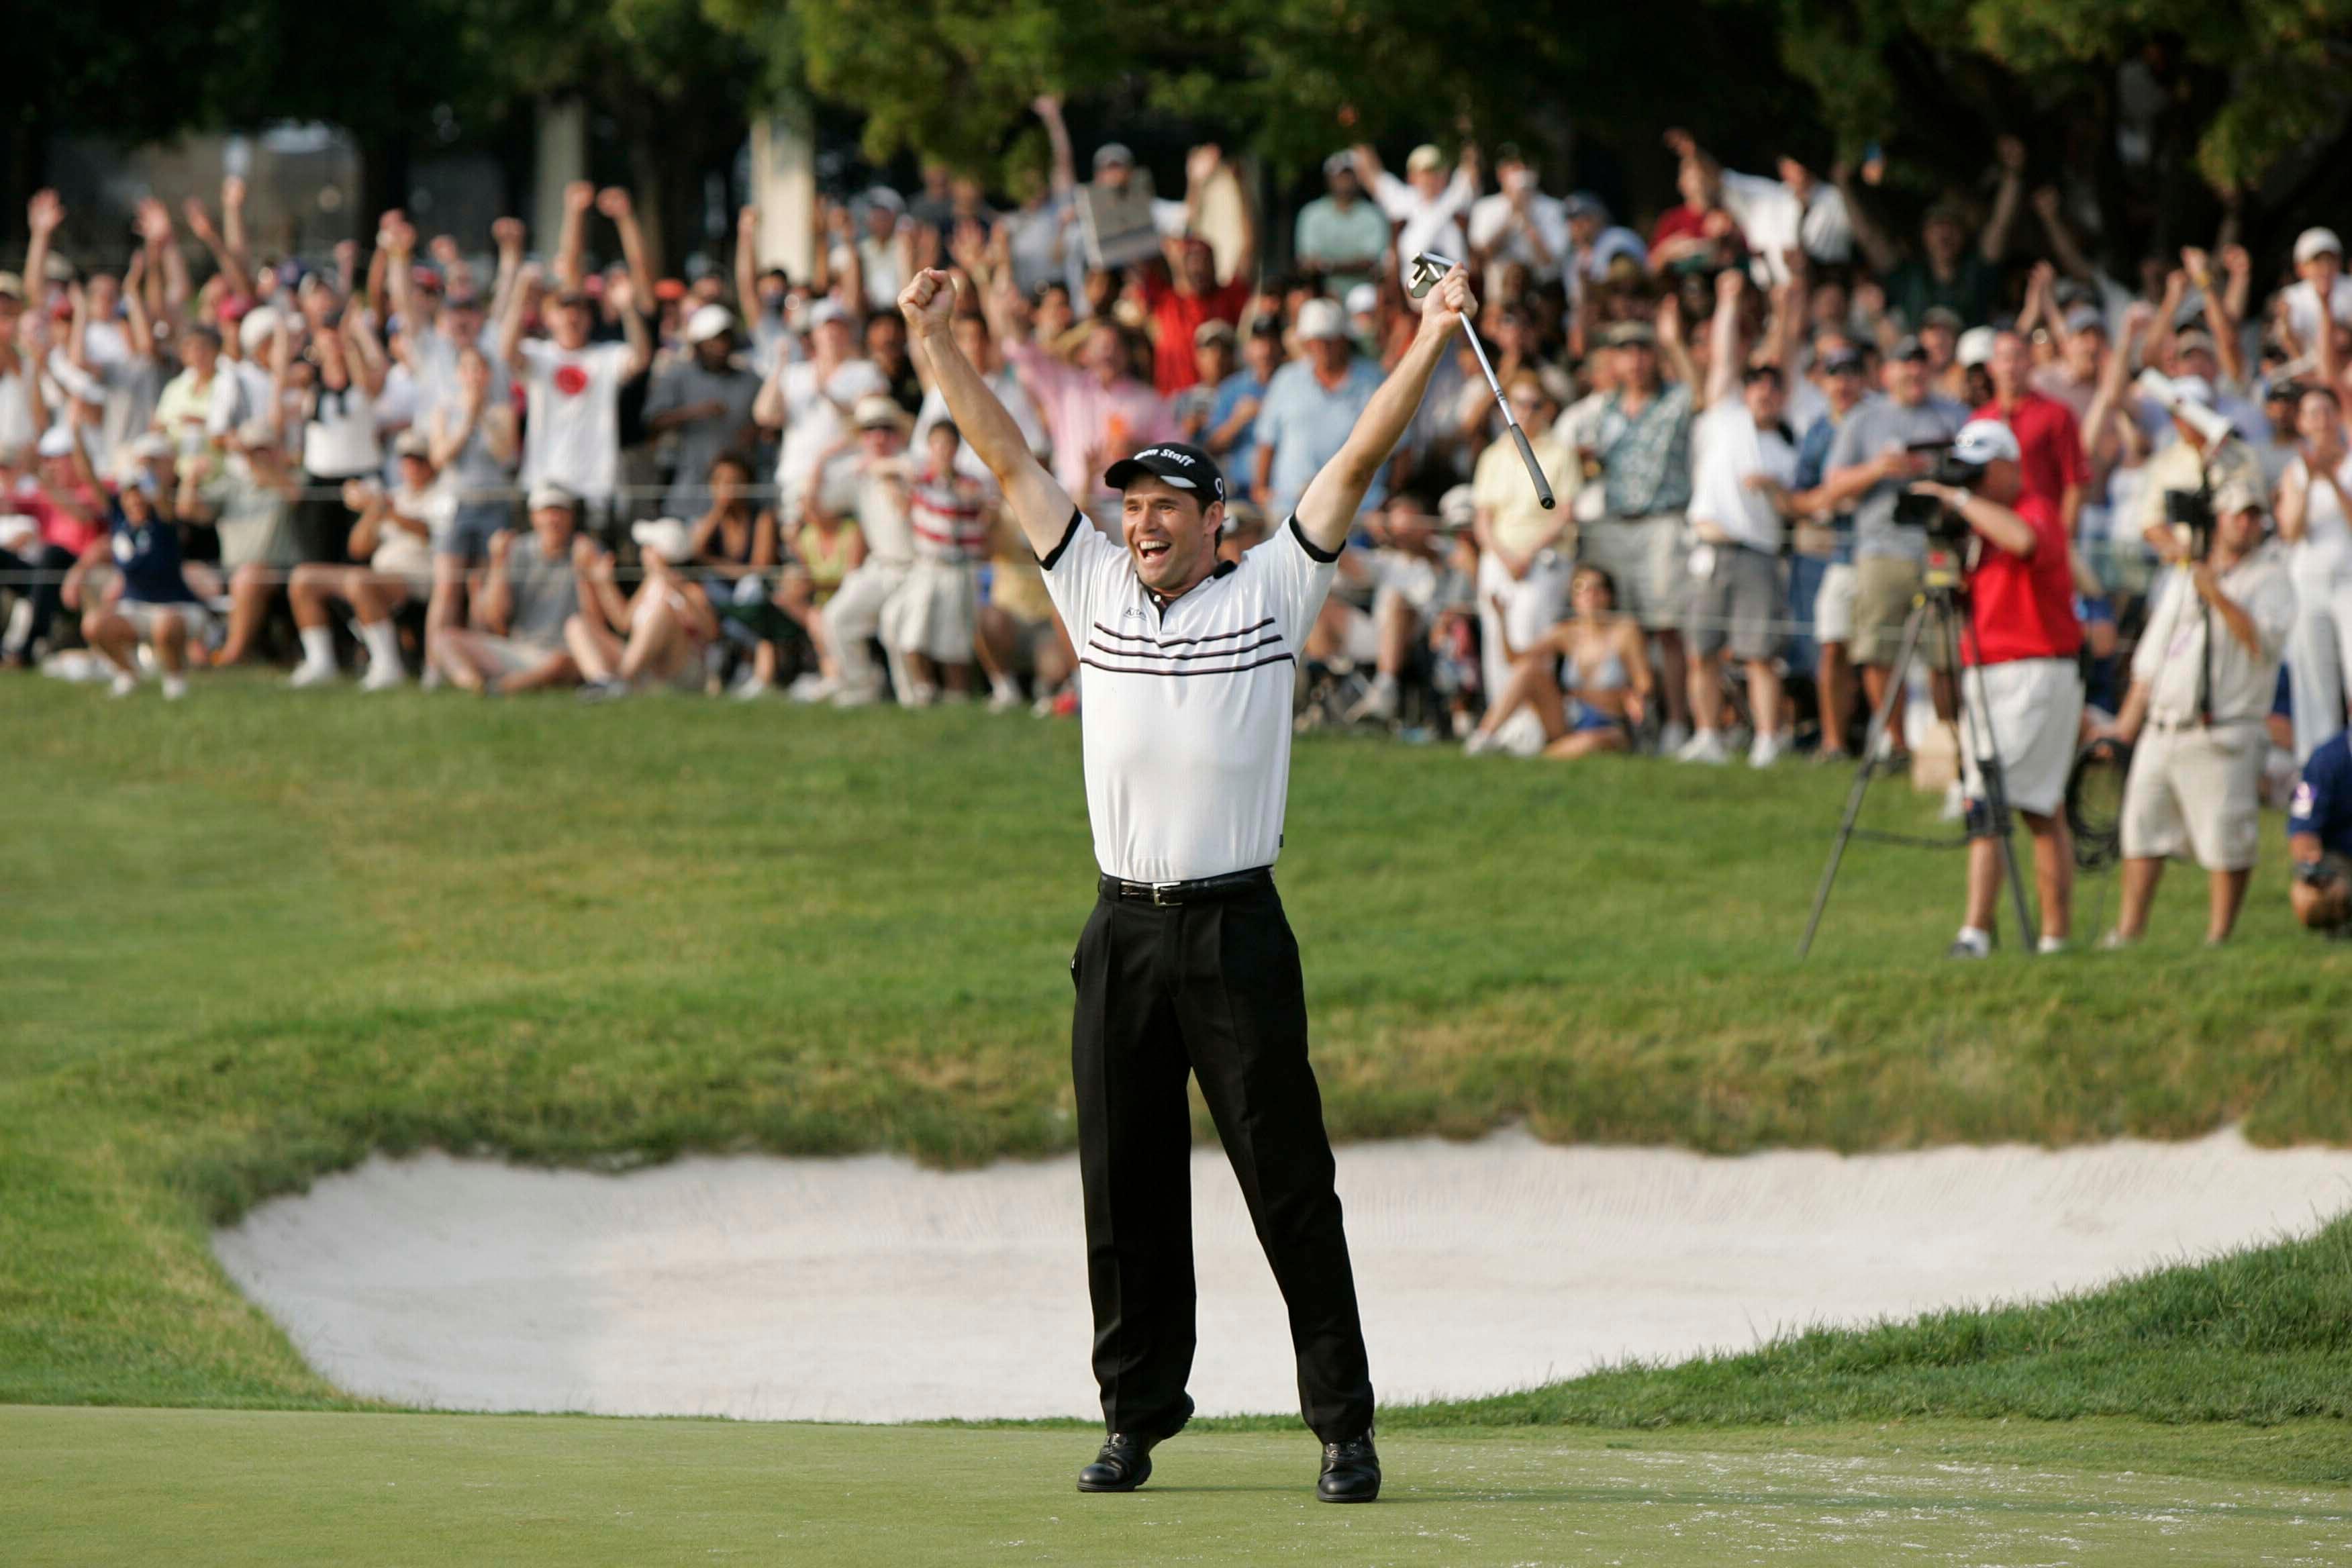 4. 2005: Harrington's winning eagle